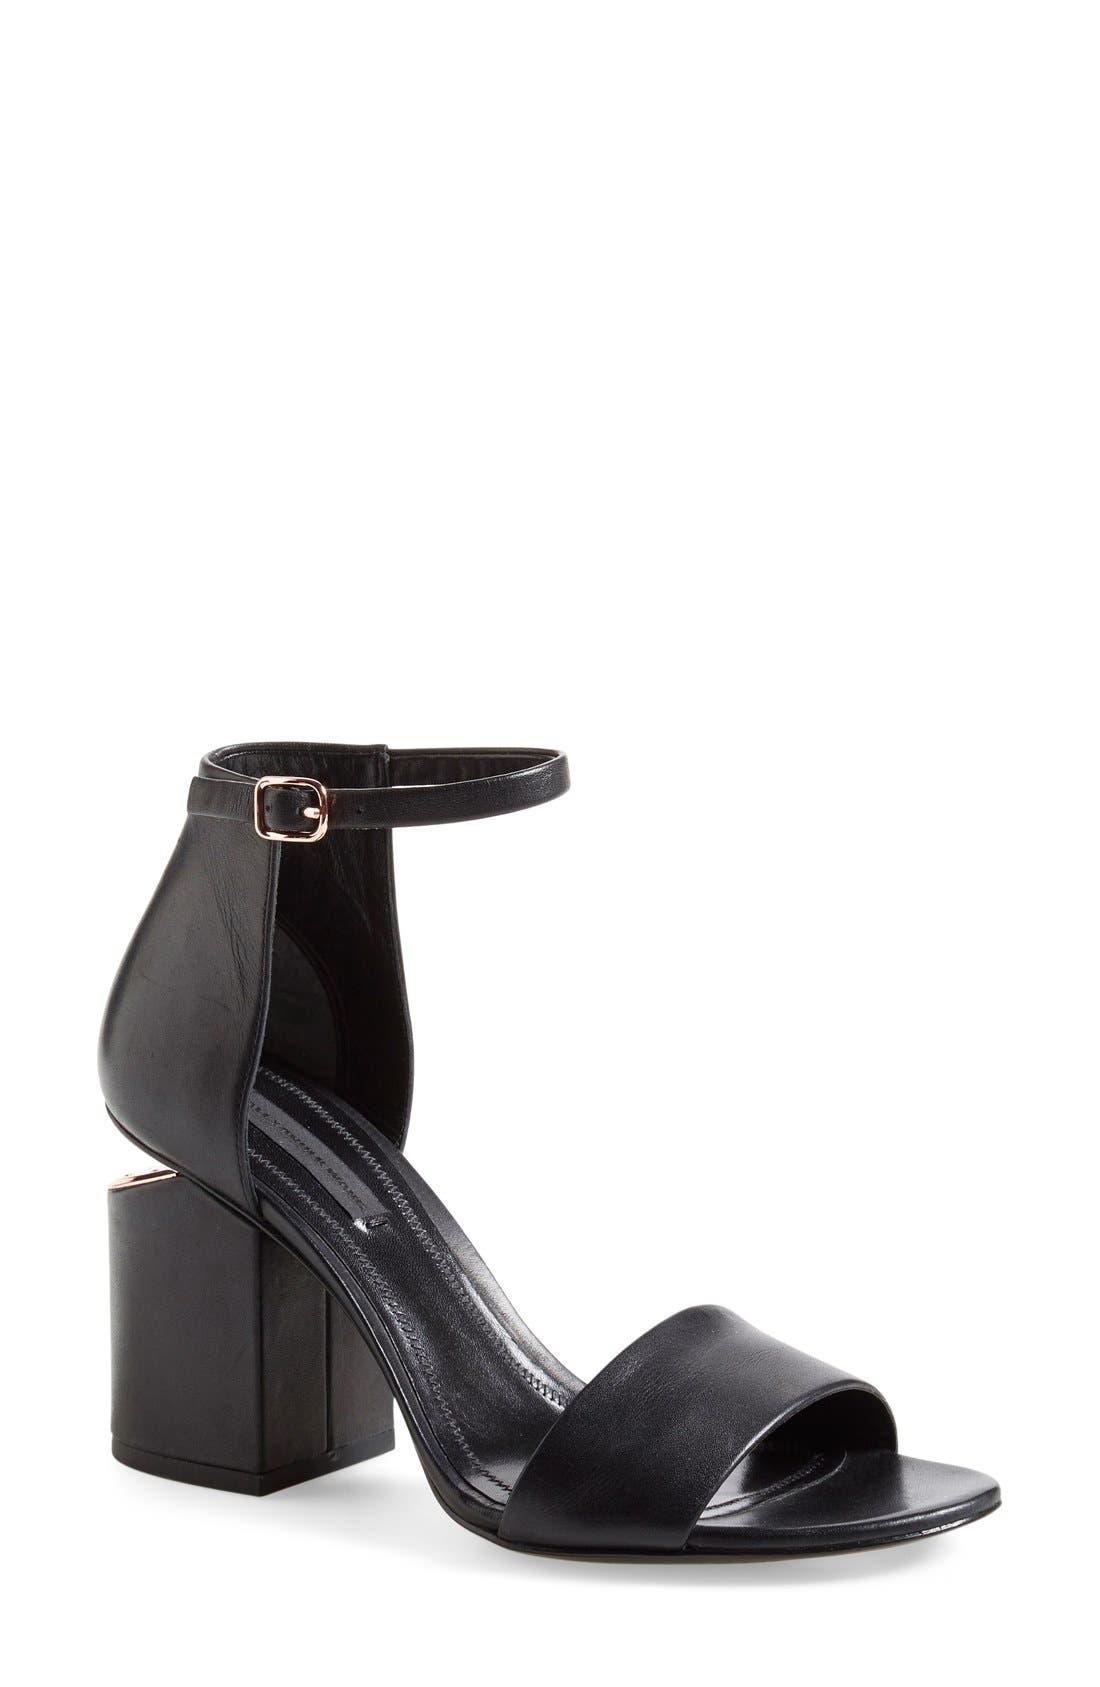 'Abby' Ankle Strap Sandal,                         Main,                         color, BLACK